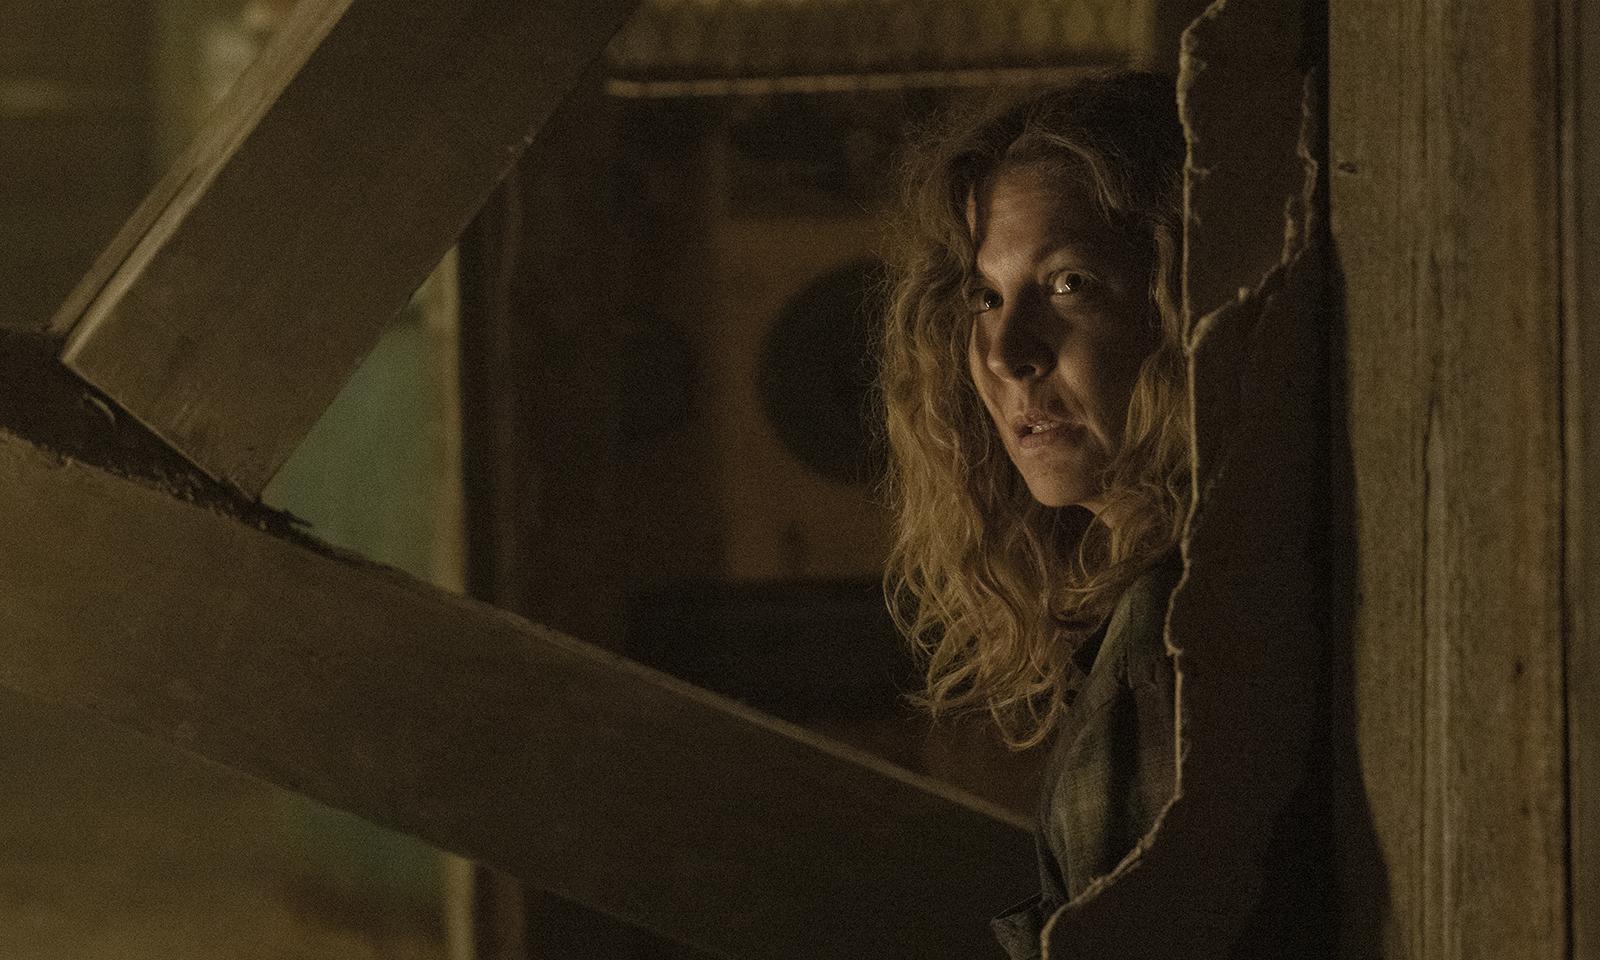 June assustada observando algo no episódio 3 da 7ª temporada de Fear the Walking Dead.